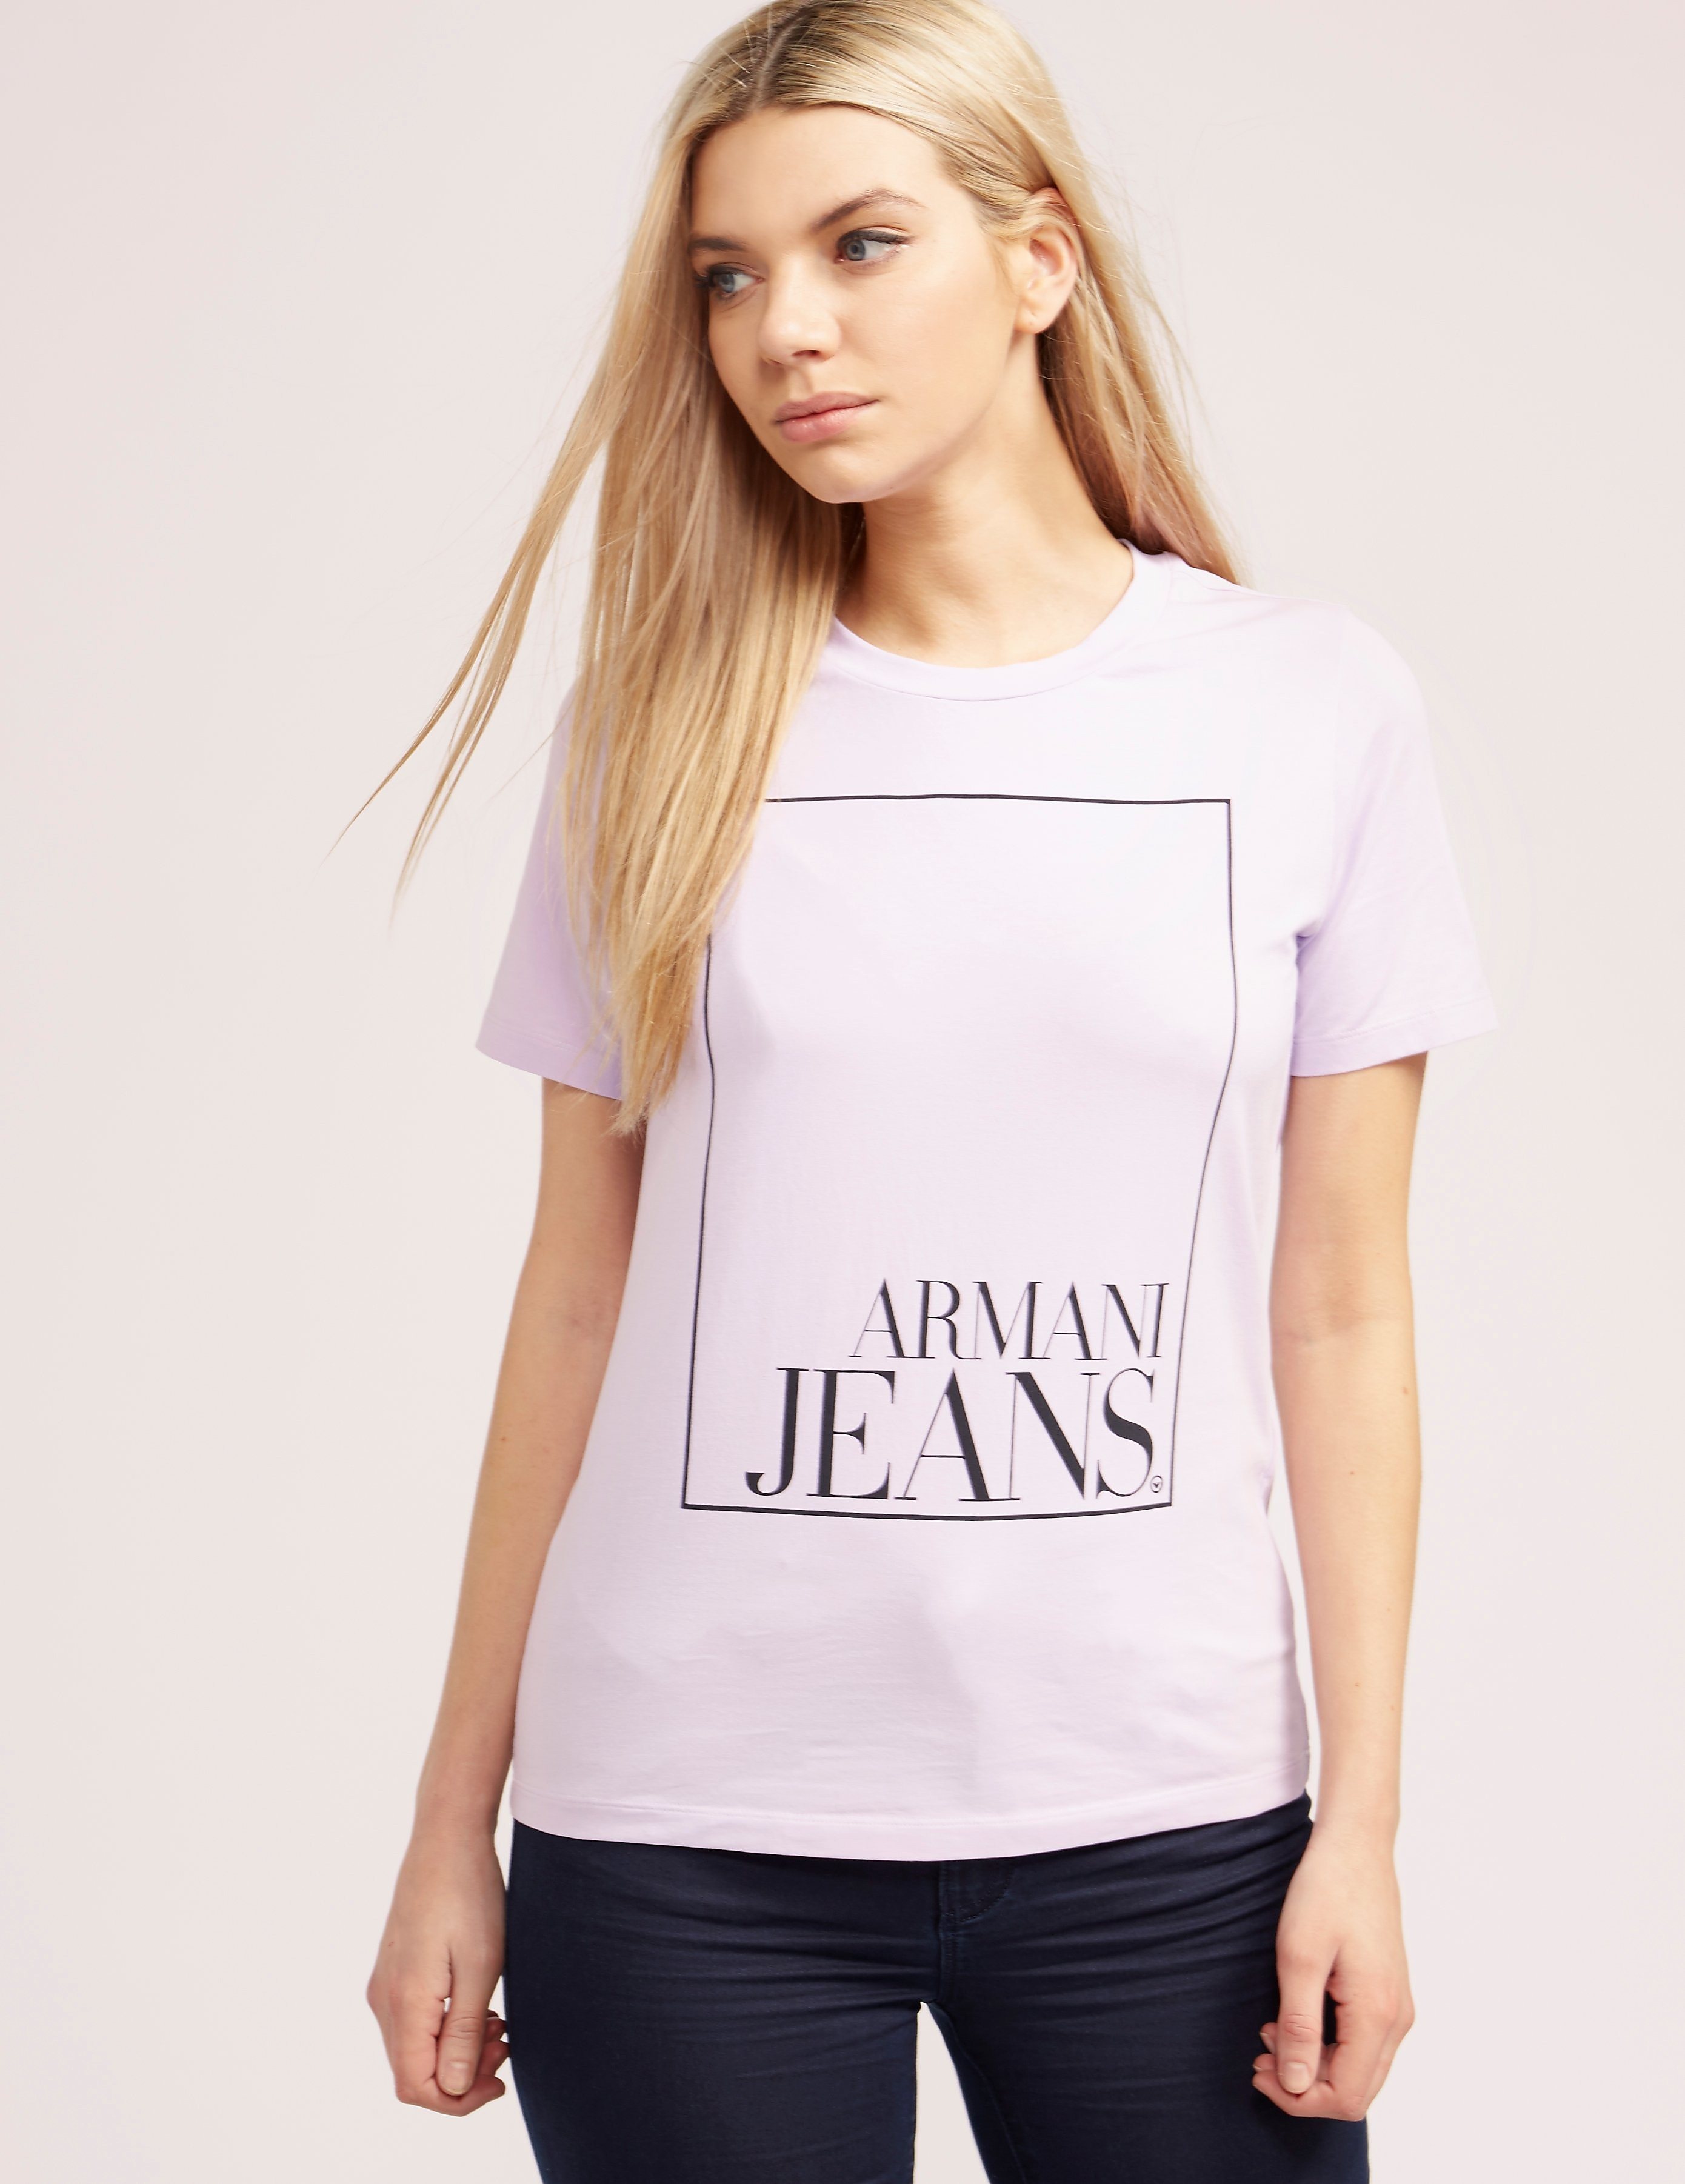 Armani Jeans Sqaure Logo T-Shirt